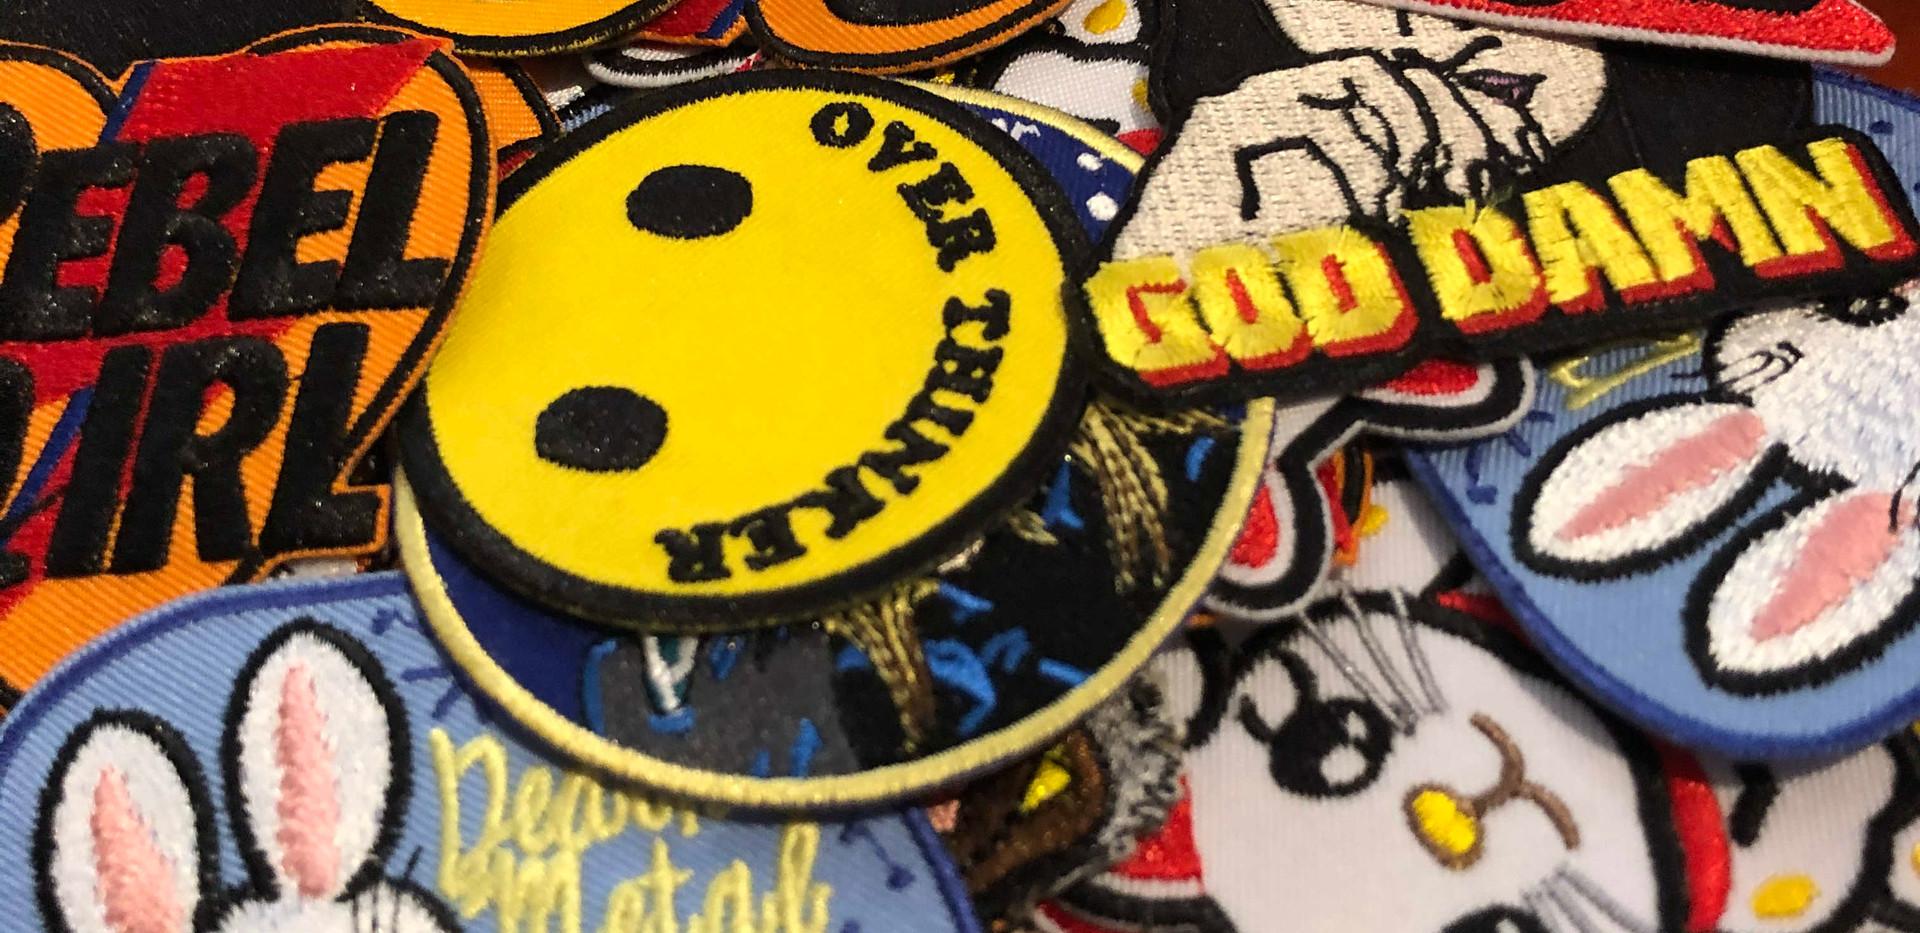 The Yellow Shop 3461.jpg